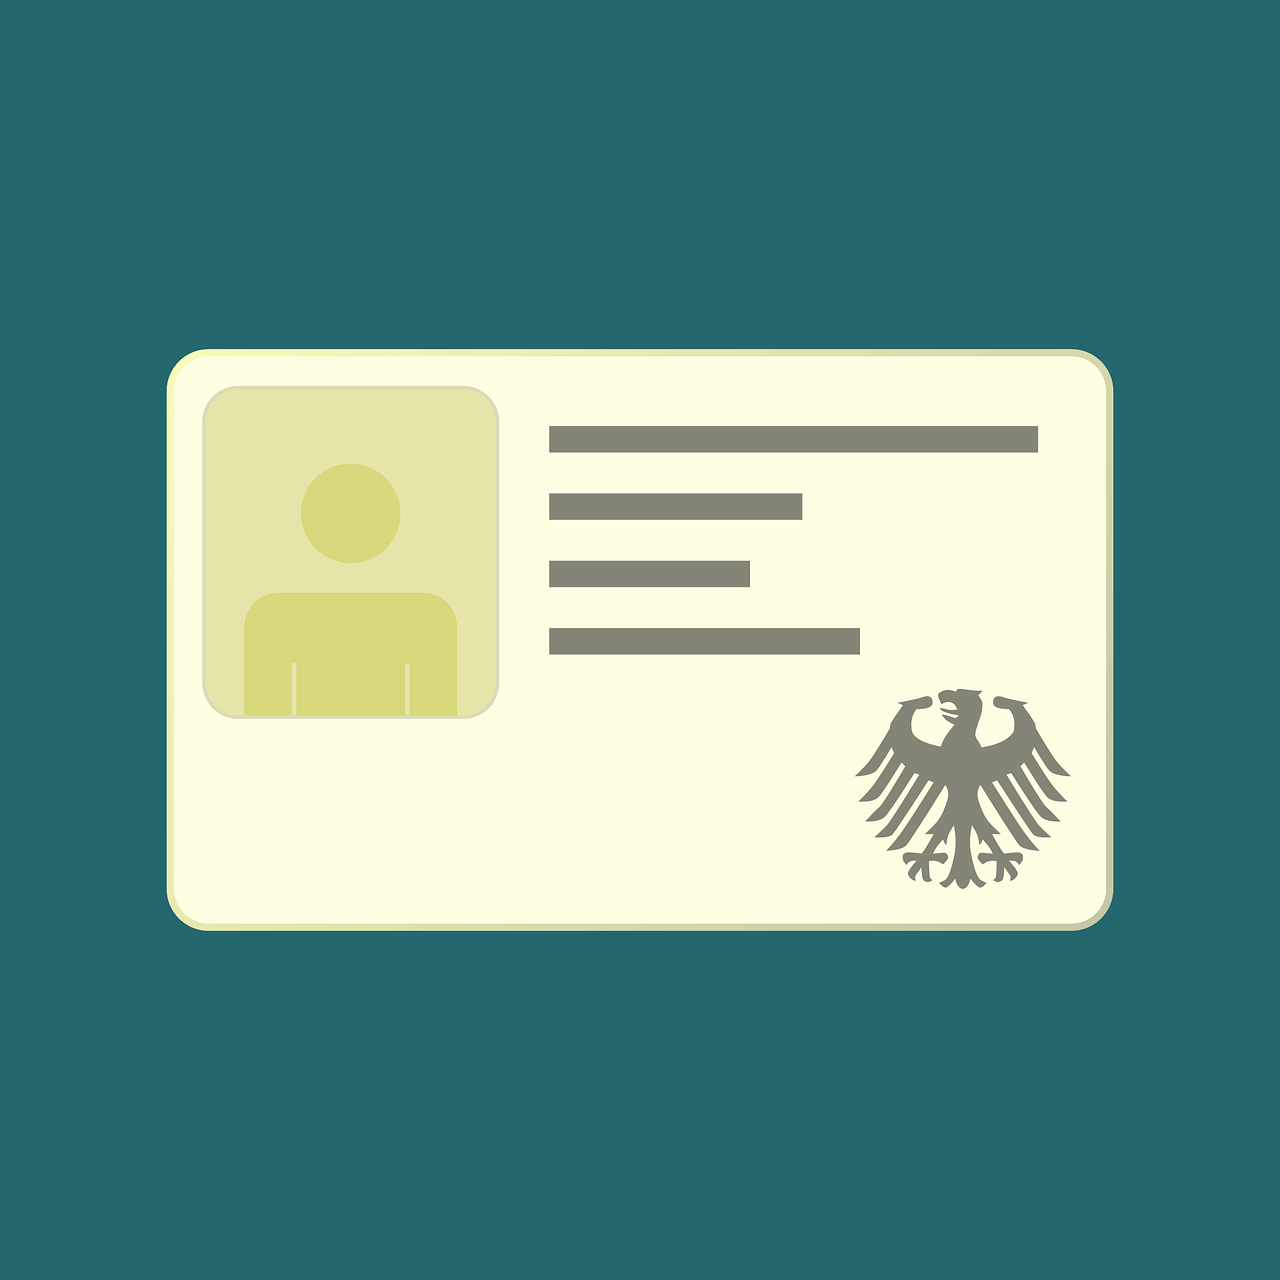 Symbolbild Ausweis